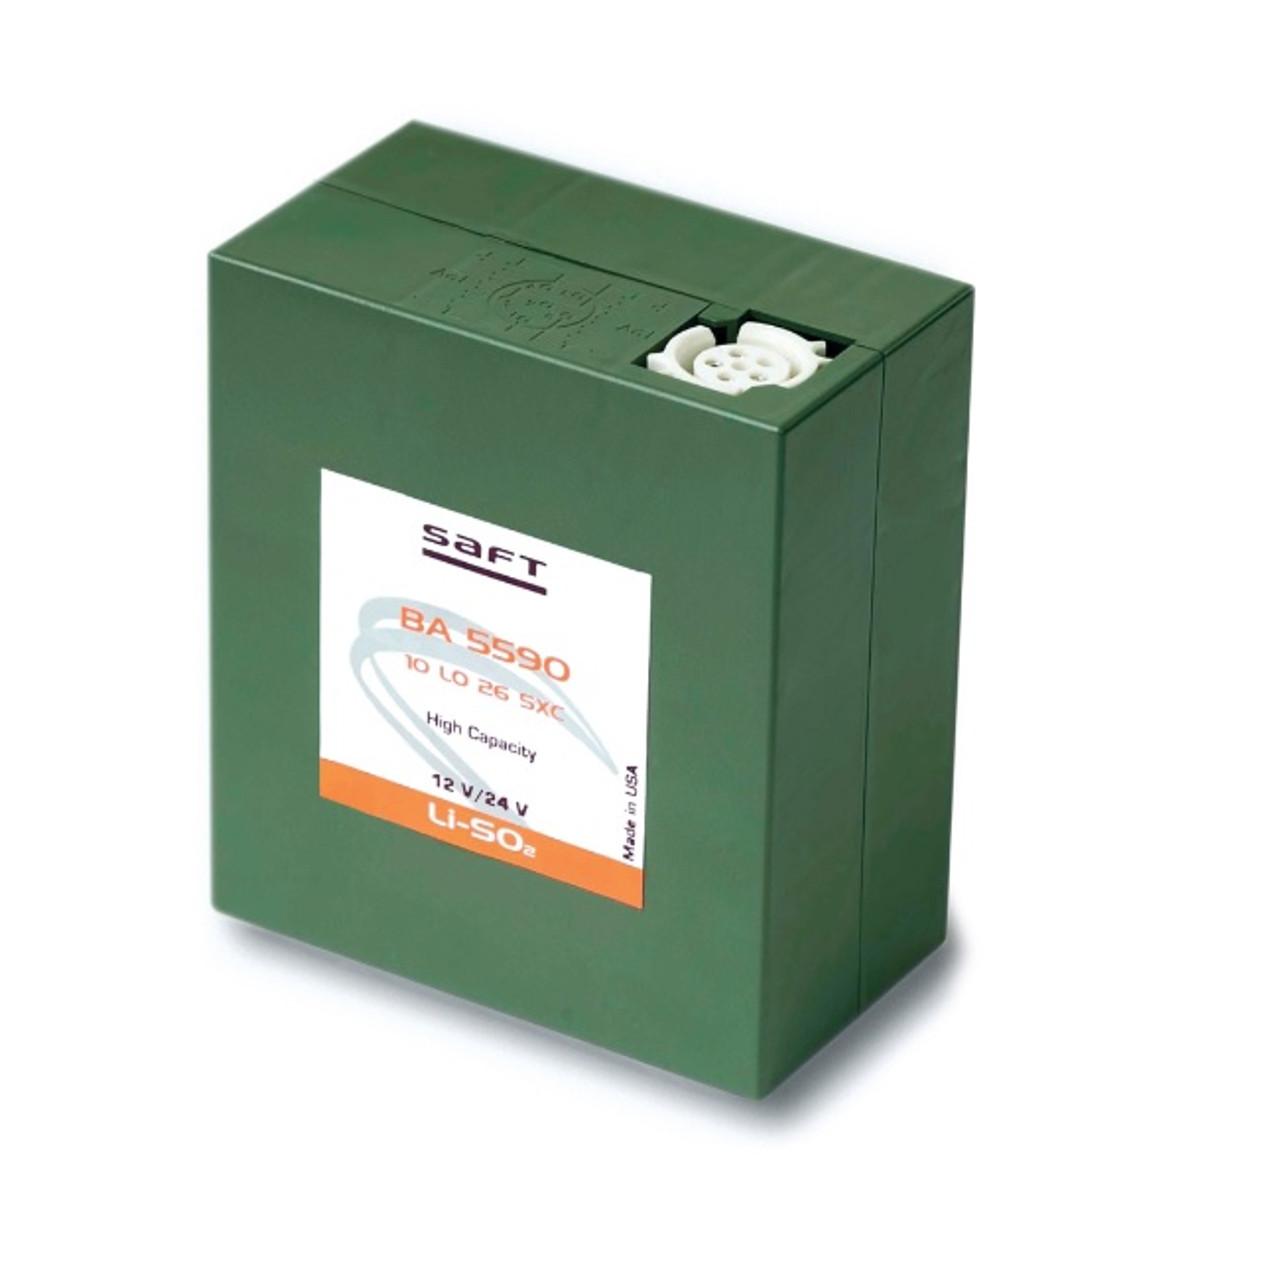 Saft BA-5590 B/U, 15 or 30 Volt Primary Lithium A Battery - Saft # 37261024